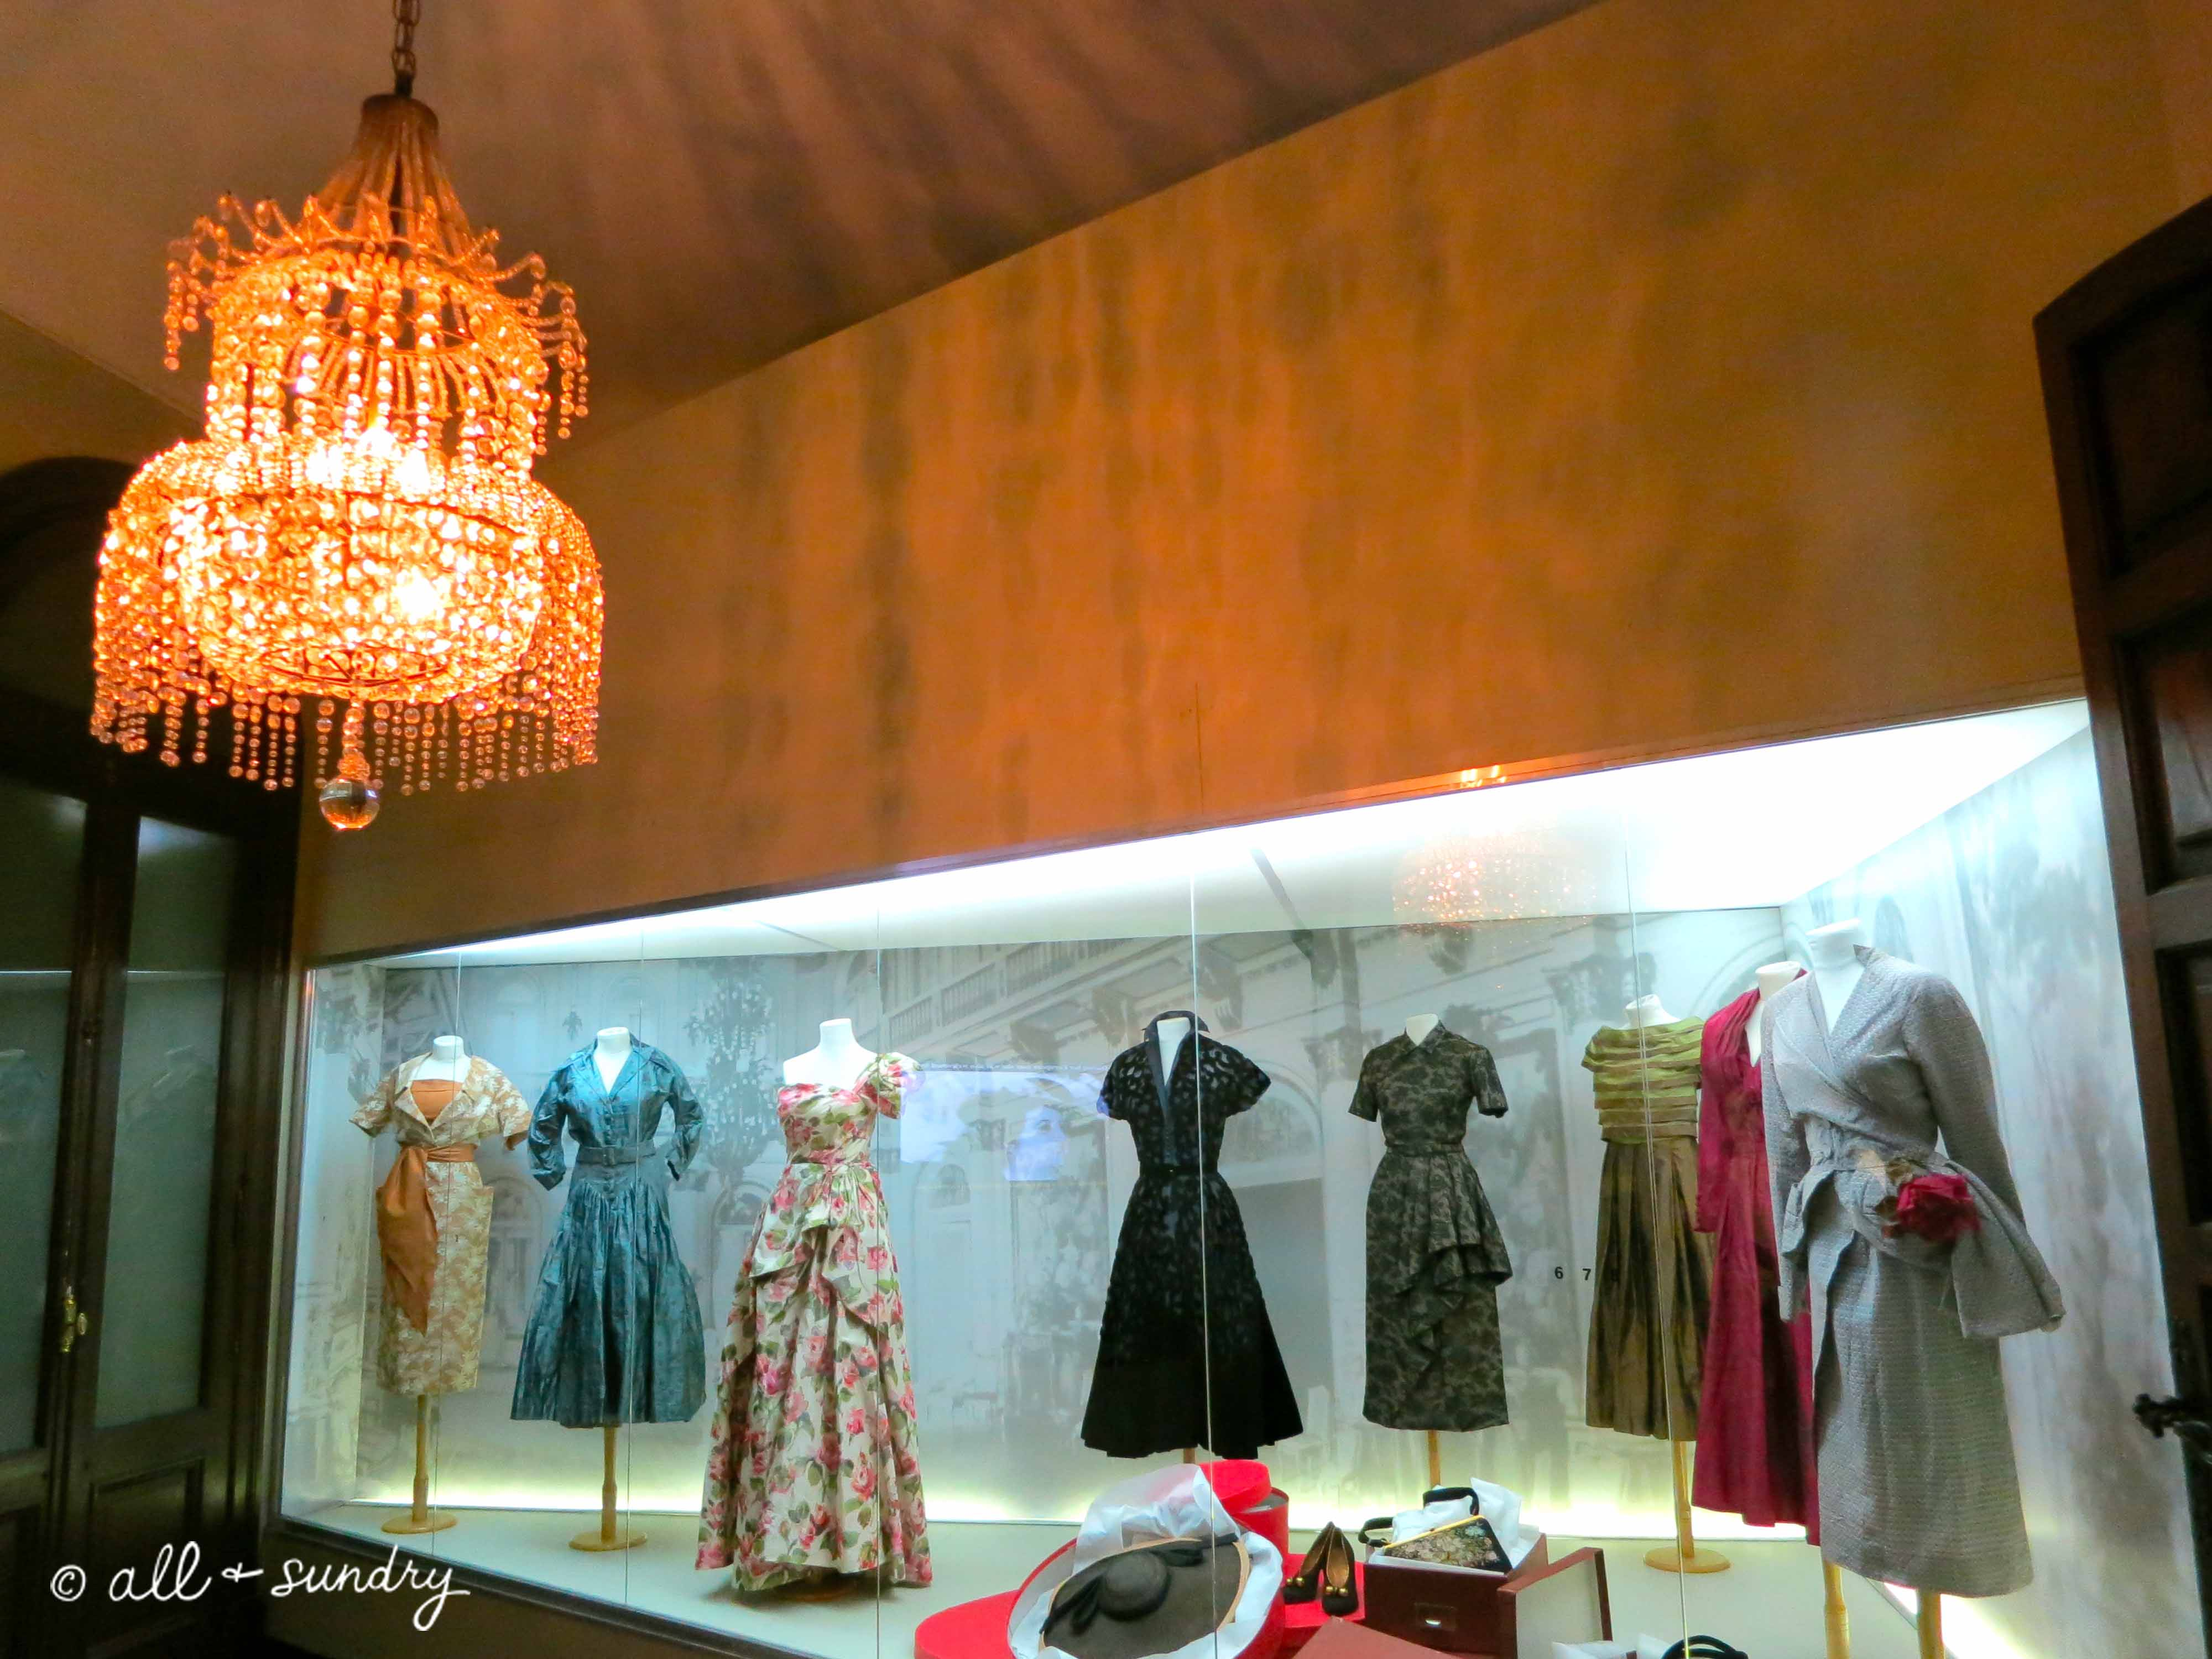 Evita clothes